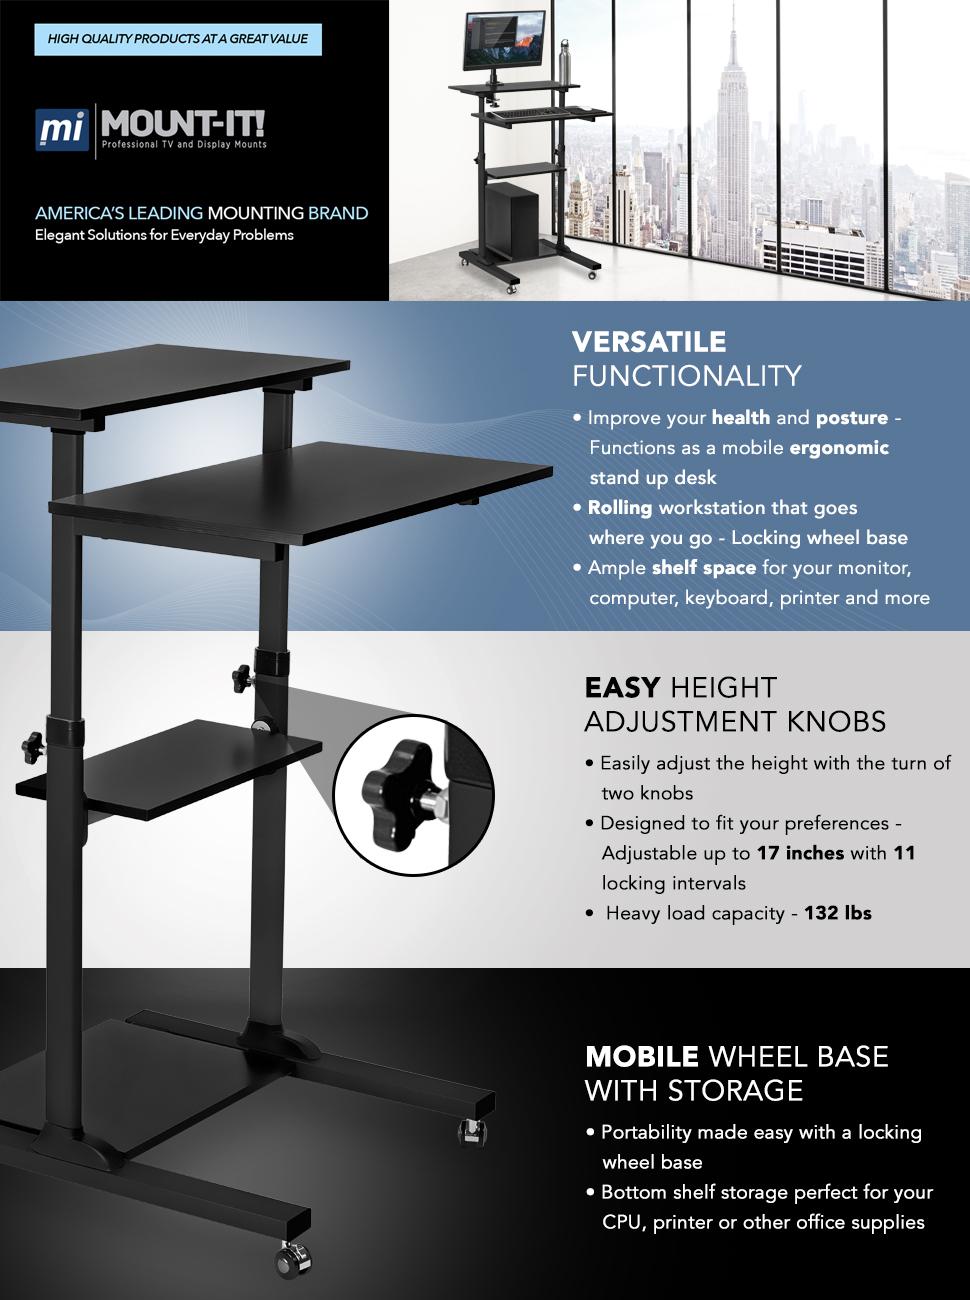 mountit stand up mobile workstation - Stand Up Workstation